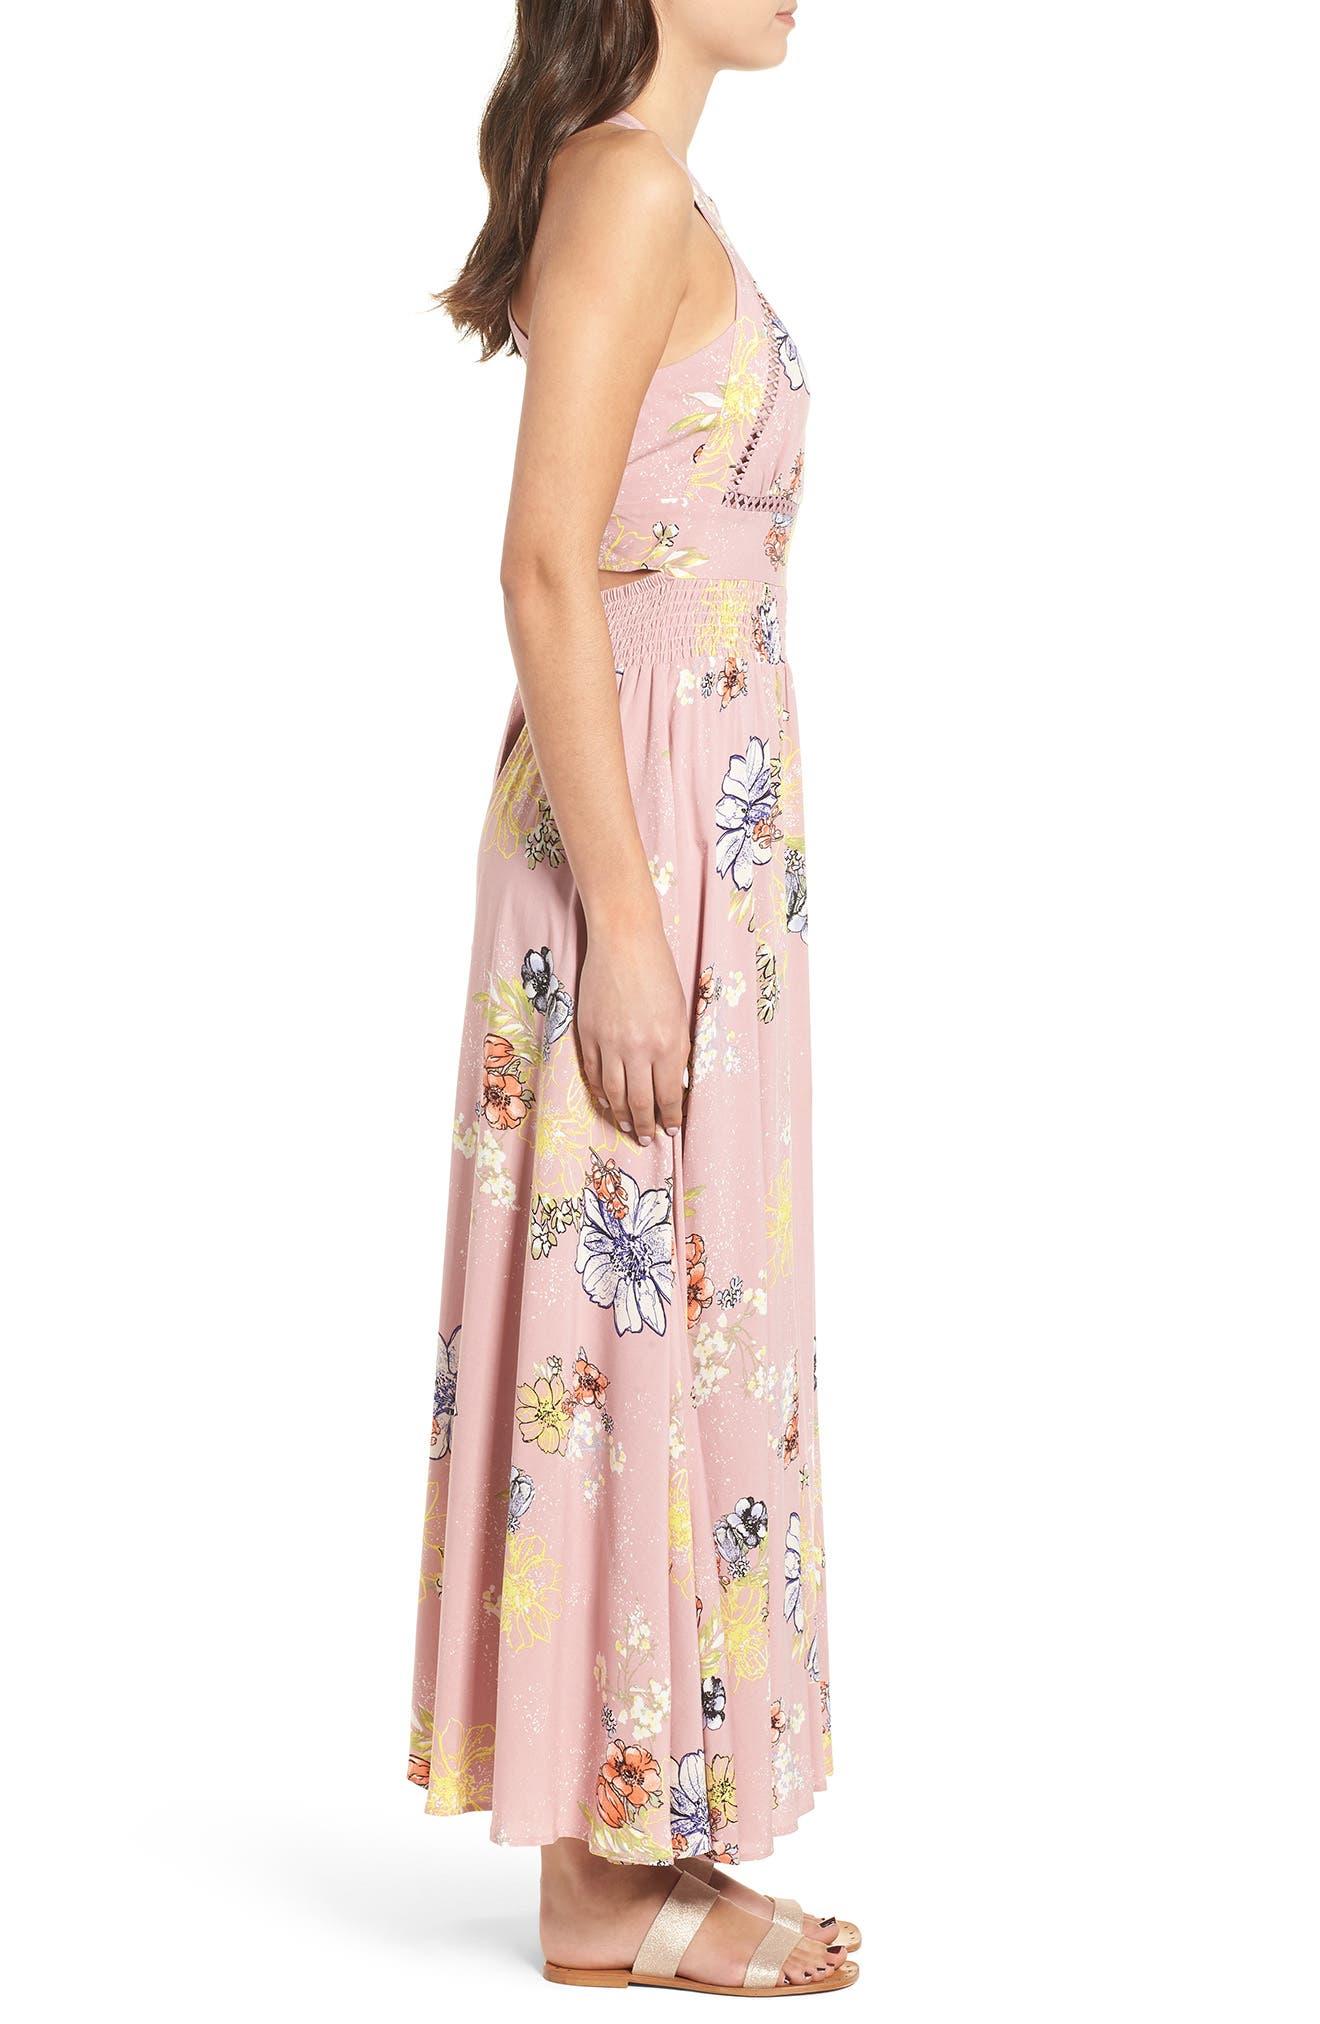 Floral Print Halter Maxi Dress,                             Alternate thumbnail 3, color,                             PINK EGRET ABSTRACT FLORAL